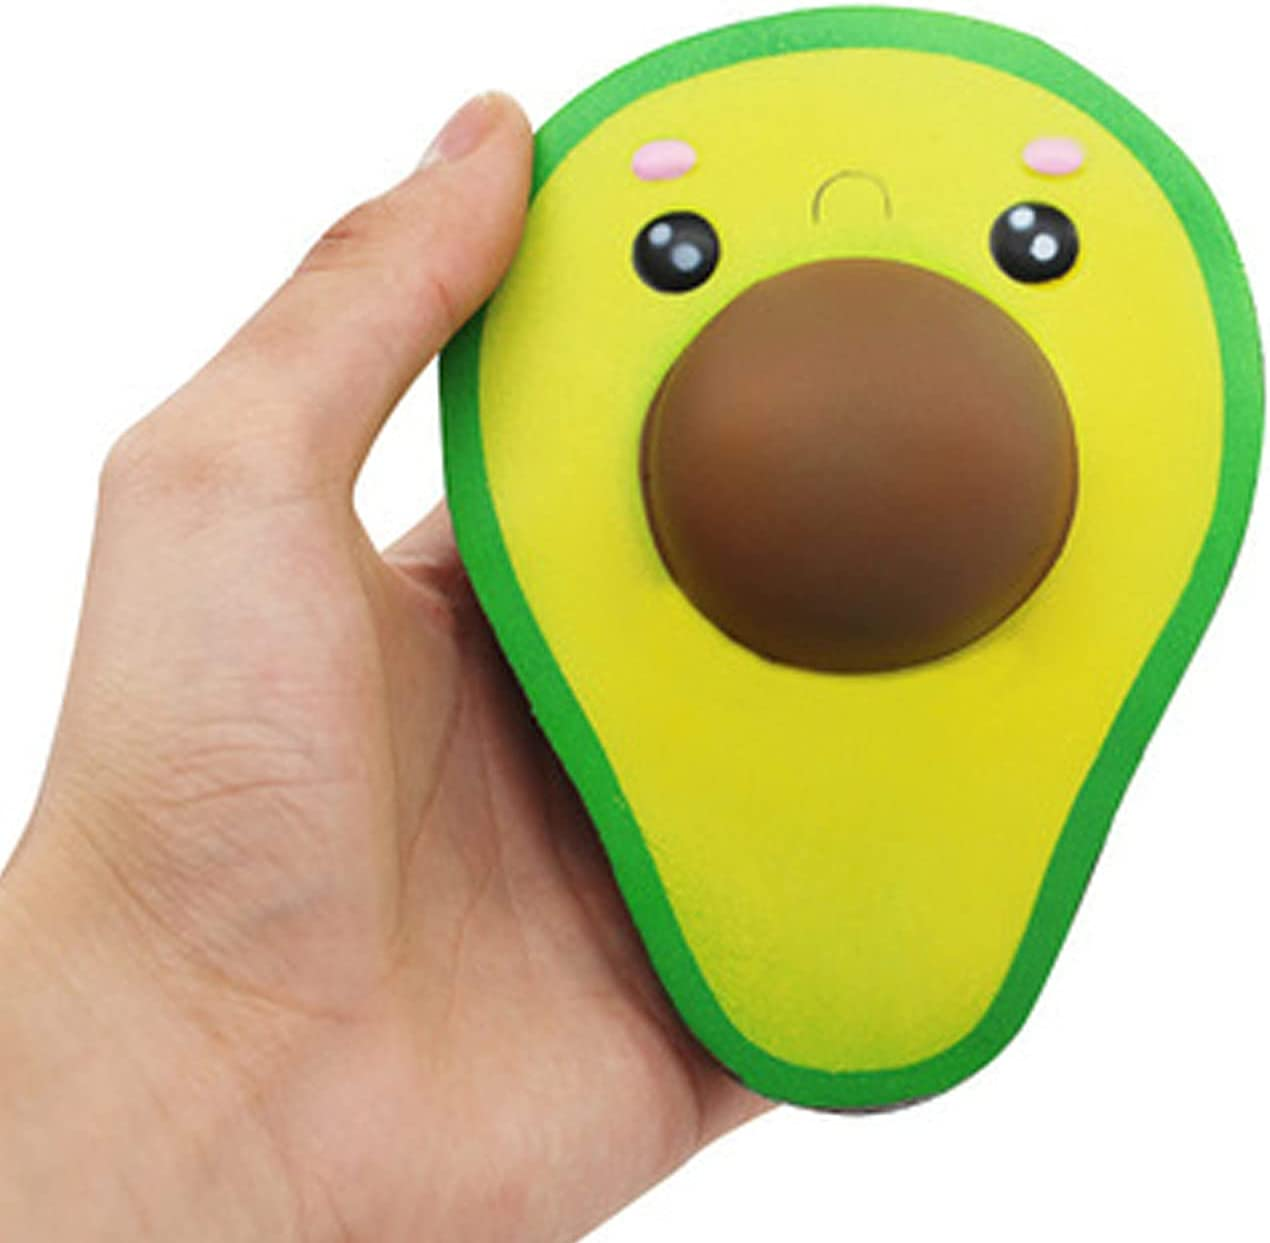 Max 63% OFF XHXH Squeeze Toy Stress At the price Balls Decompress Sensory Fidget Toys